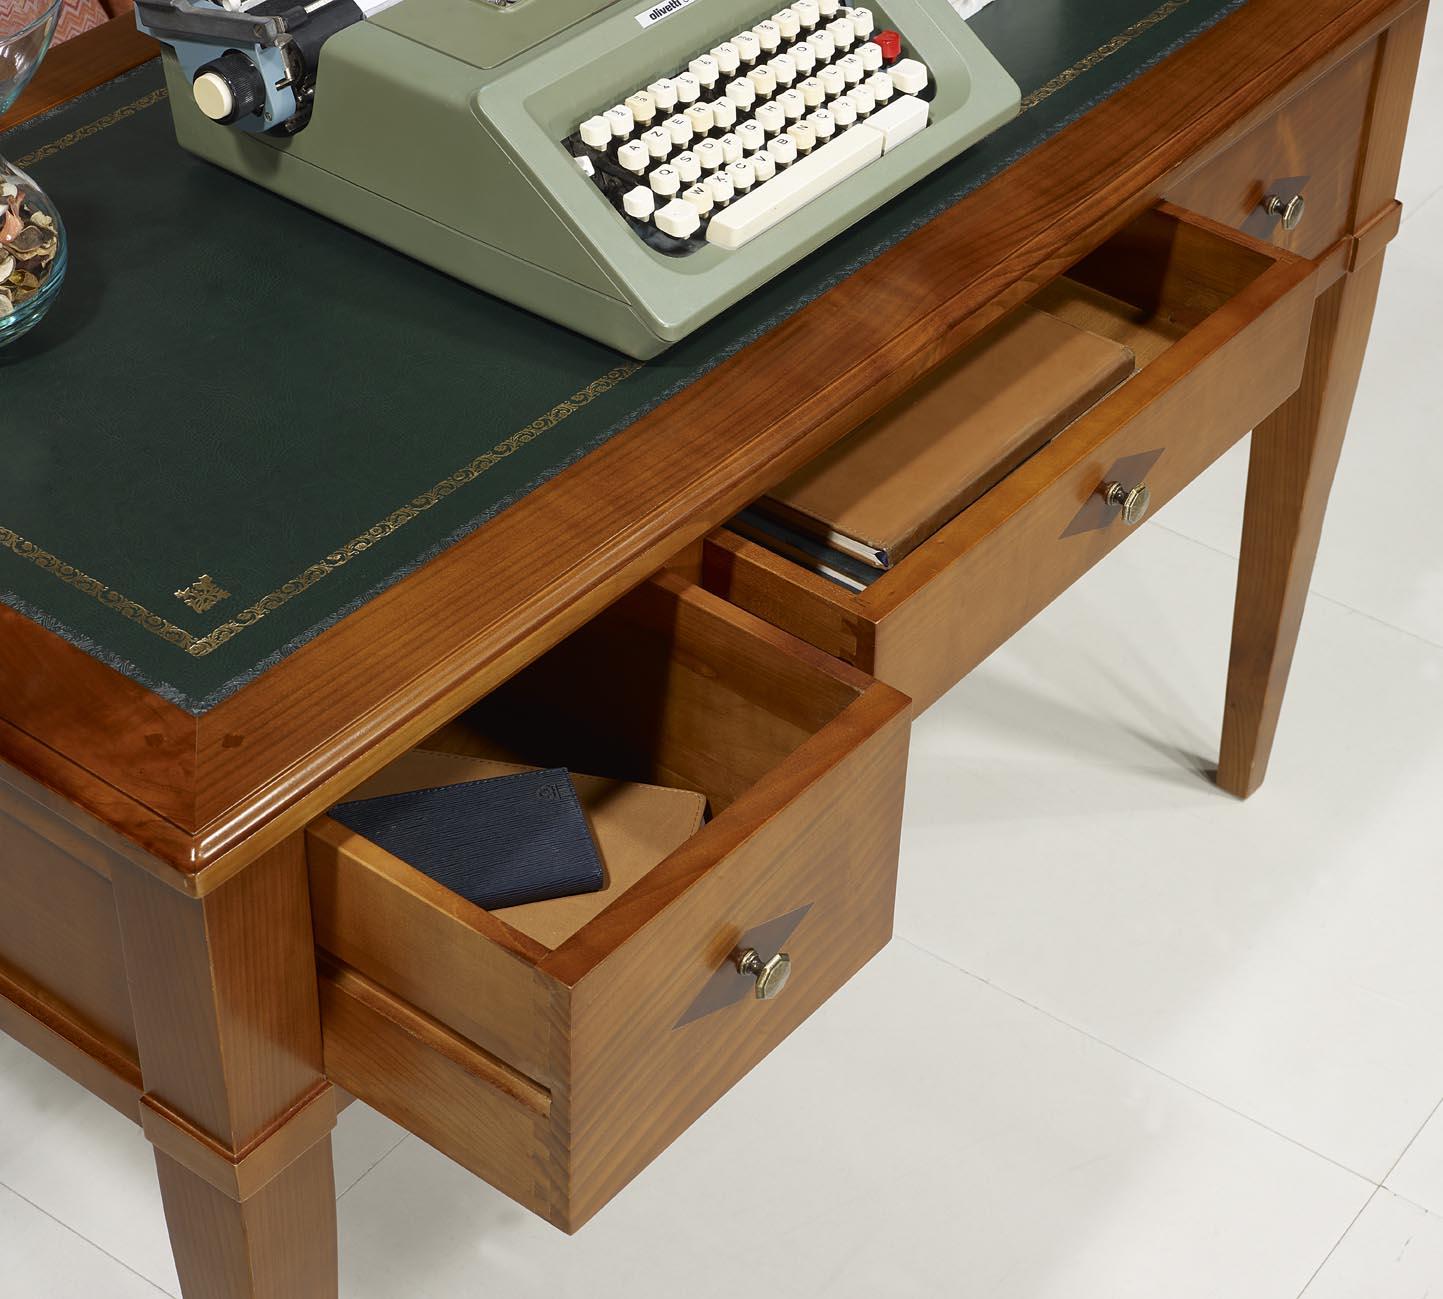 bureau 3 tiroirs 1 2 ministre ine en merisier massif de style directoire meuble en merisier. Black Bedroom Furniture Sets. Home Design Ideas